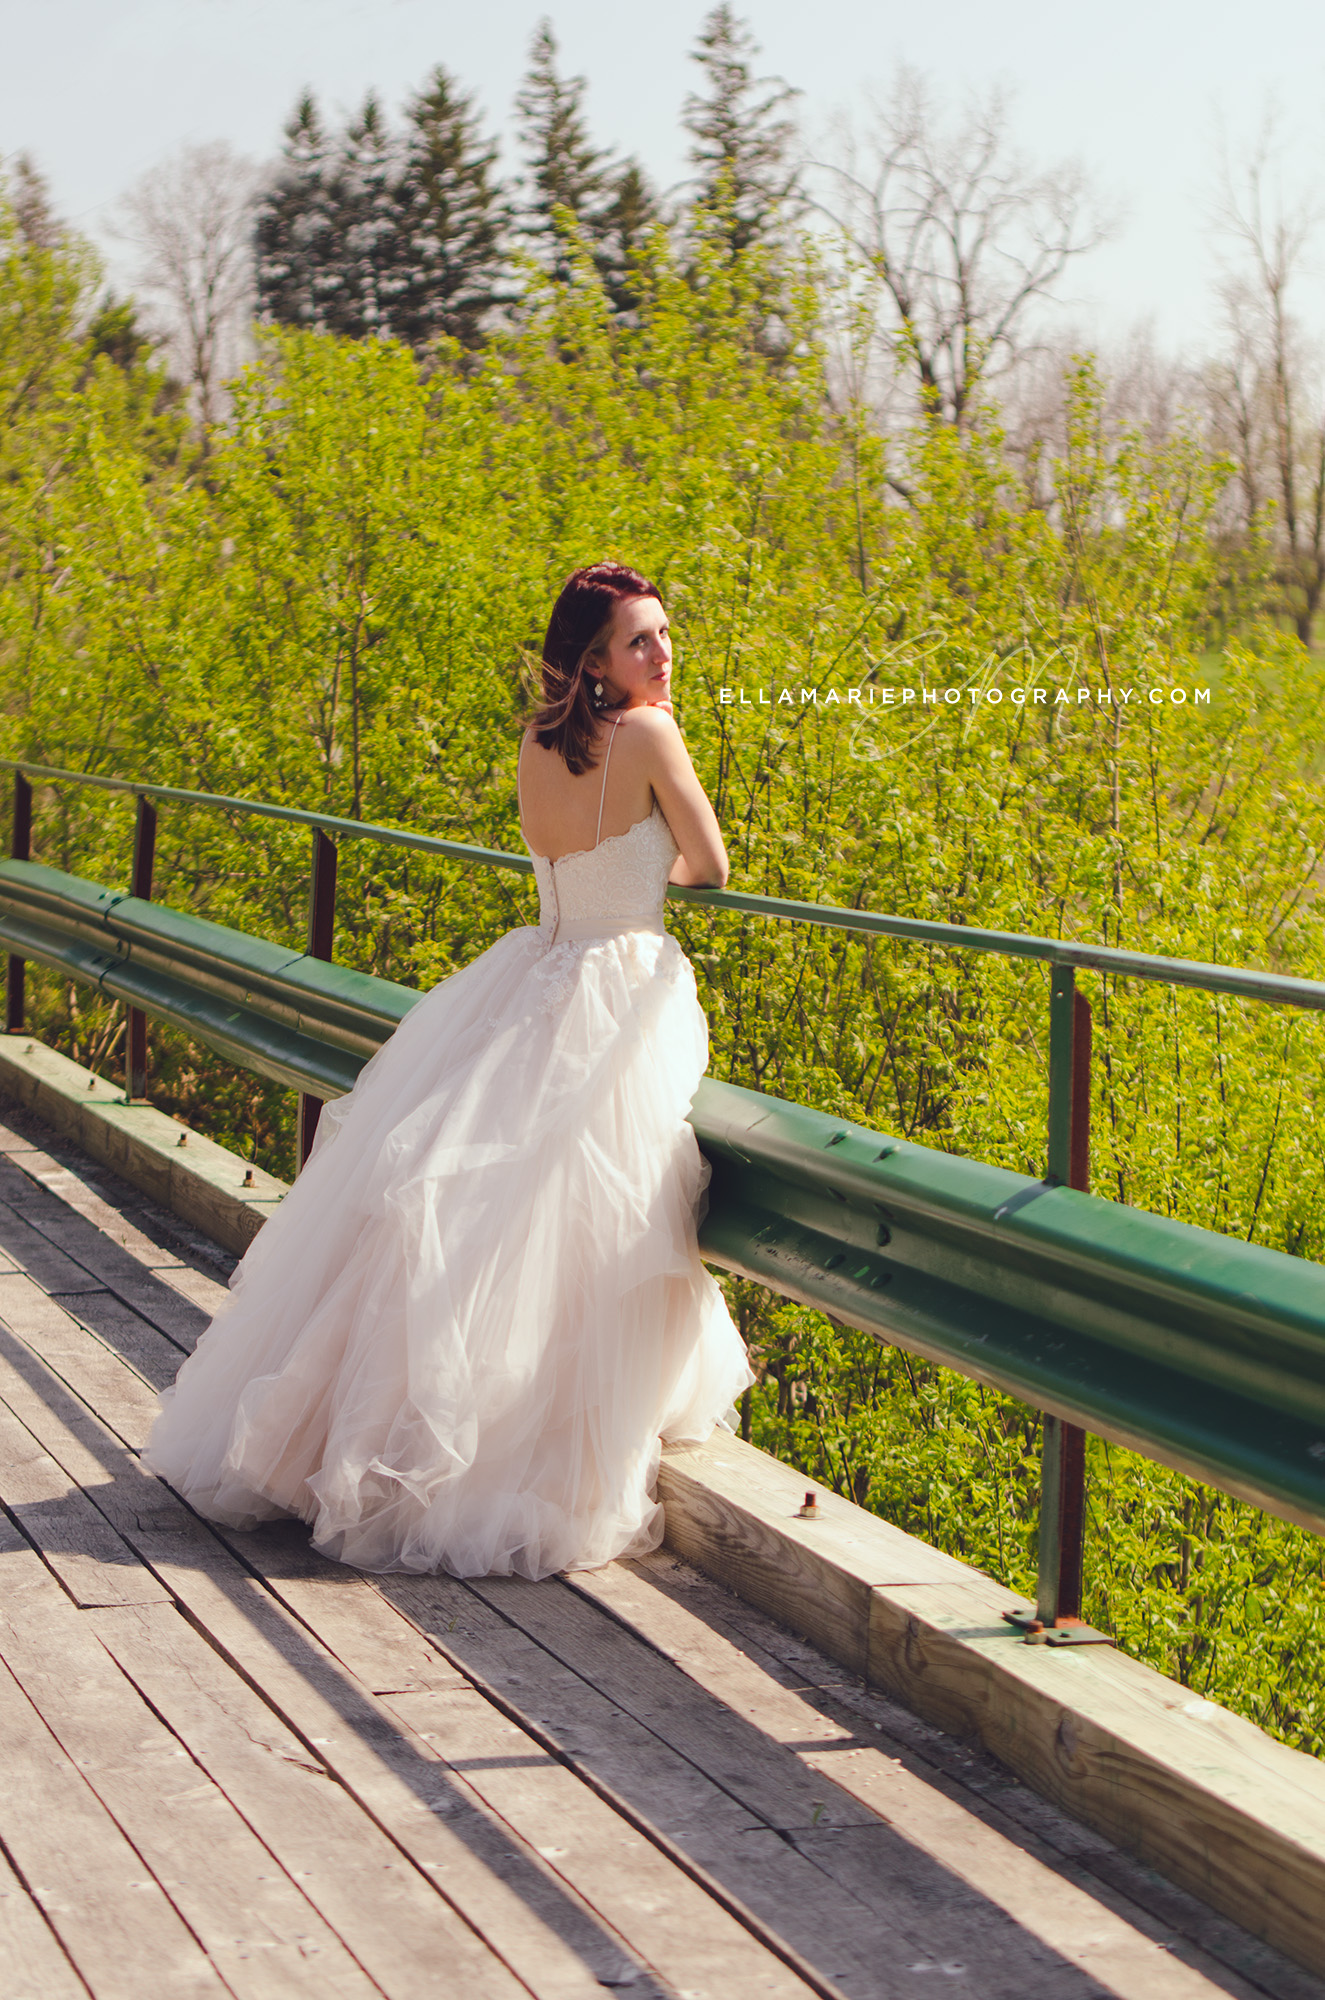 EllaMariePhotography_wedding_Baden_ON_New_Hamburg_Stratford_Waterloo_Kitchener_Guelph_Cambridge_Listowel_photographer_photography_07.jpg